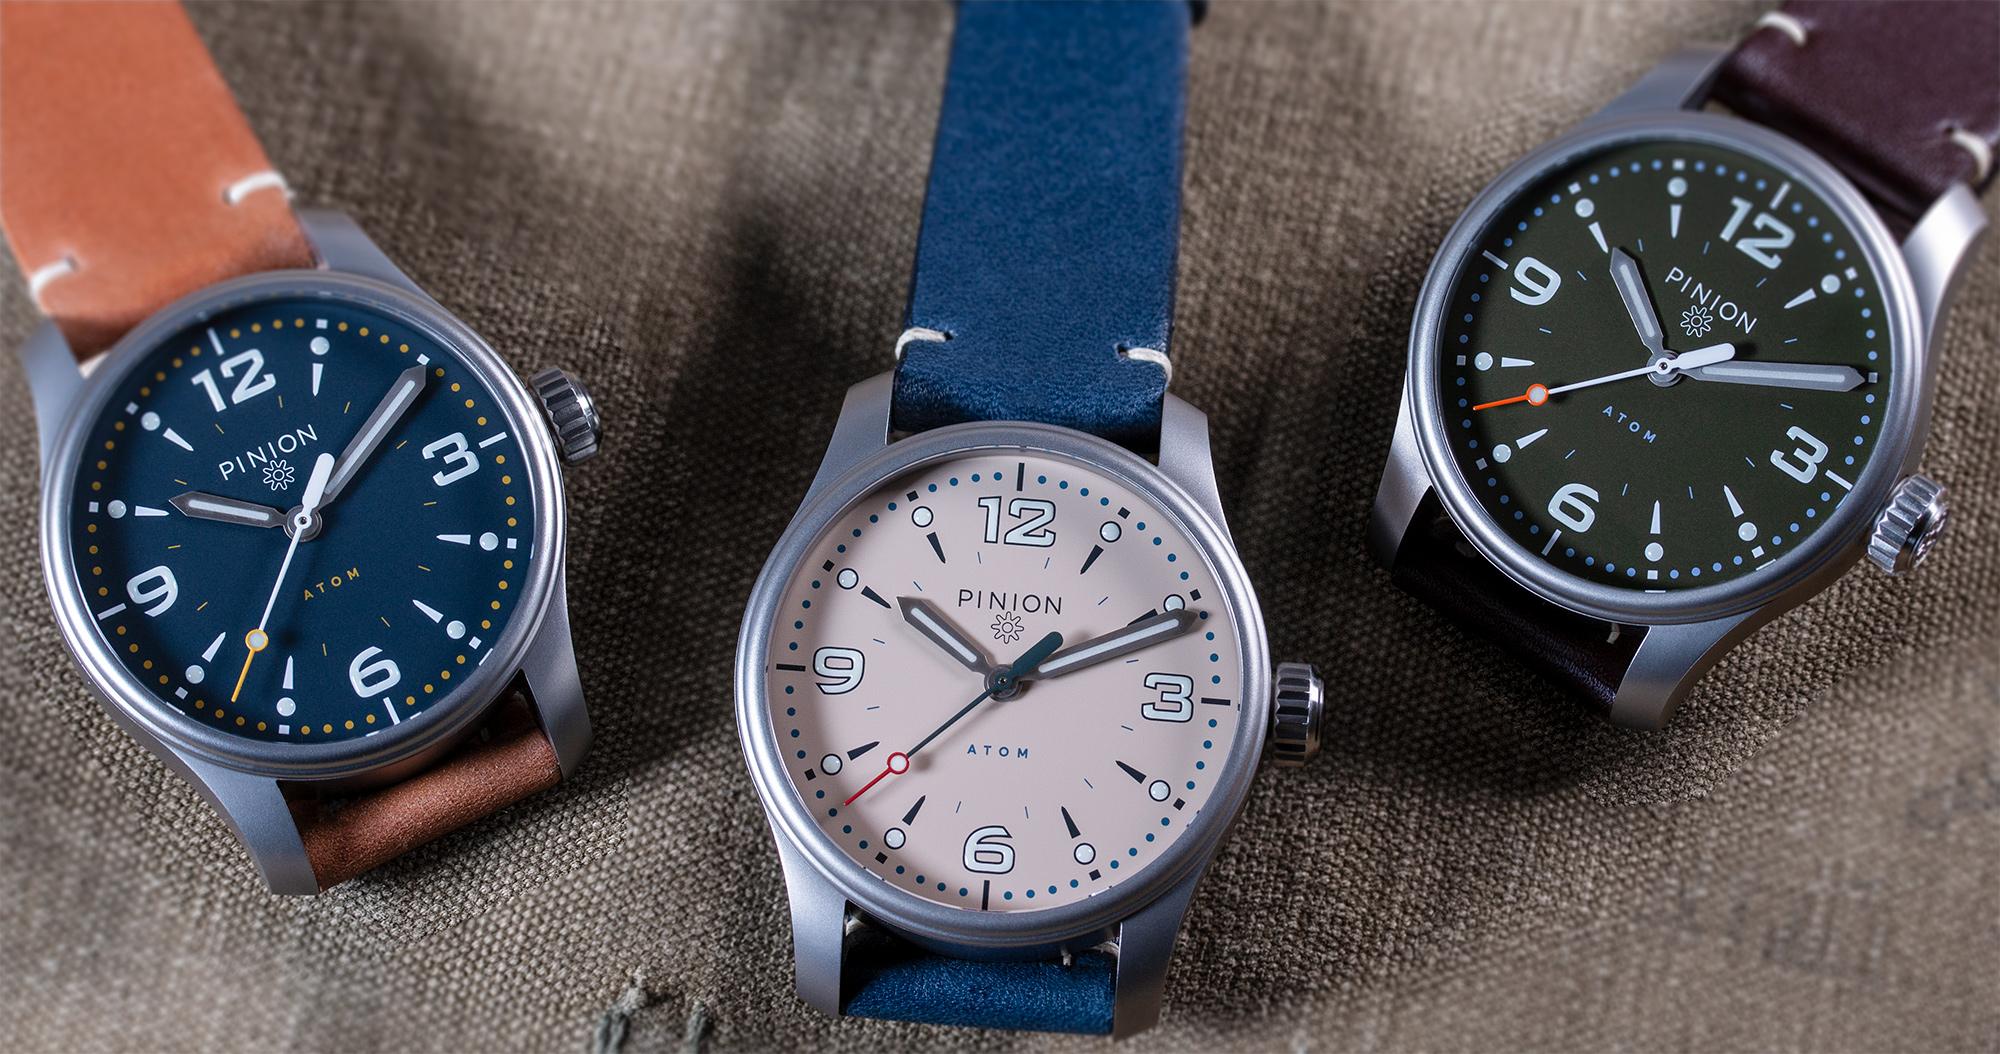 british-watches-pinion-atom-39mm-watch-collection